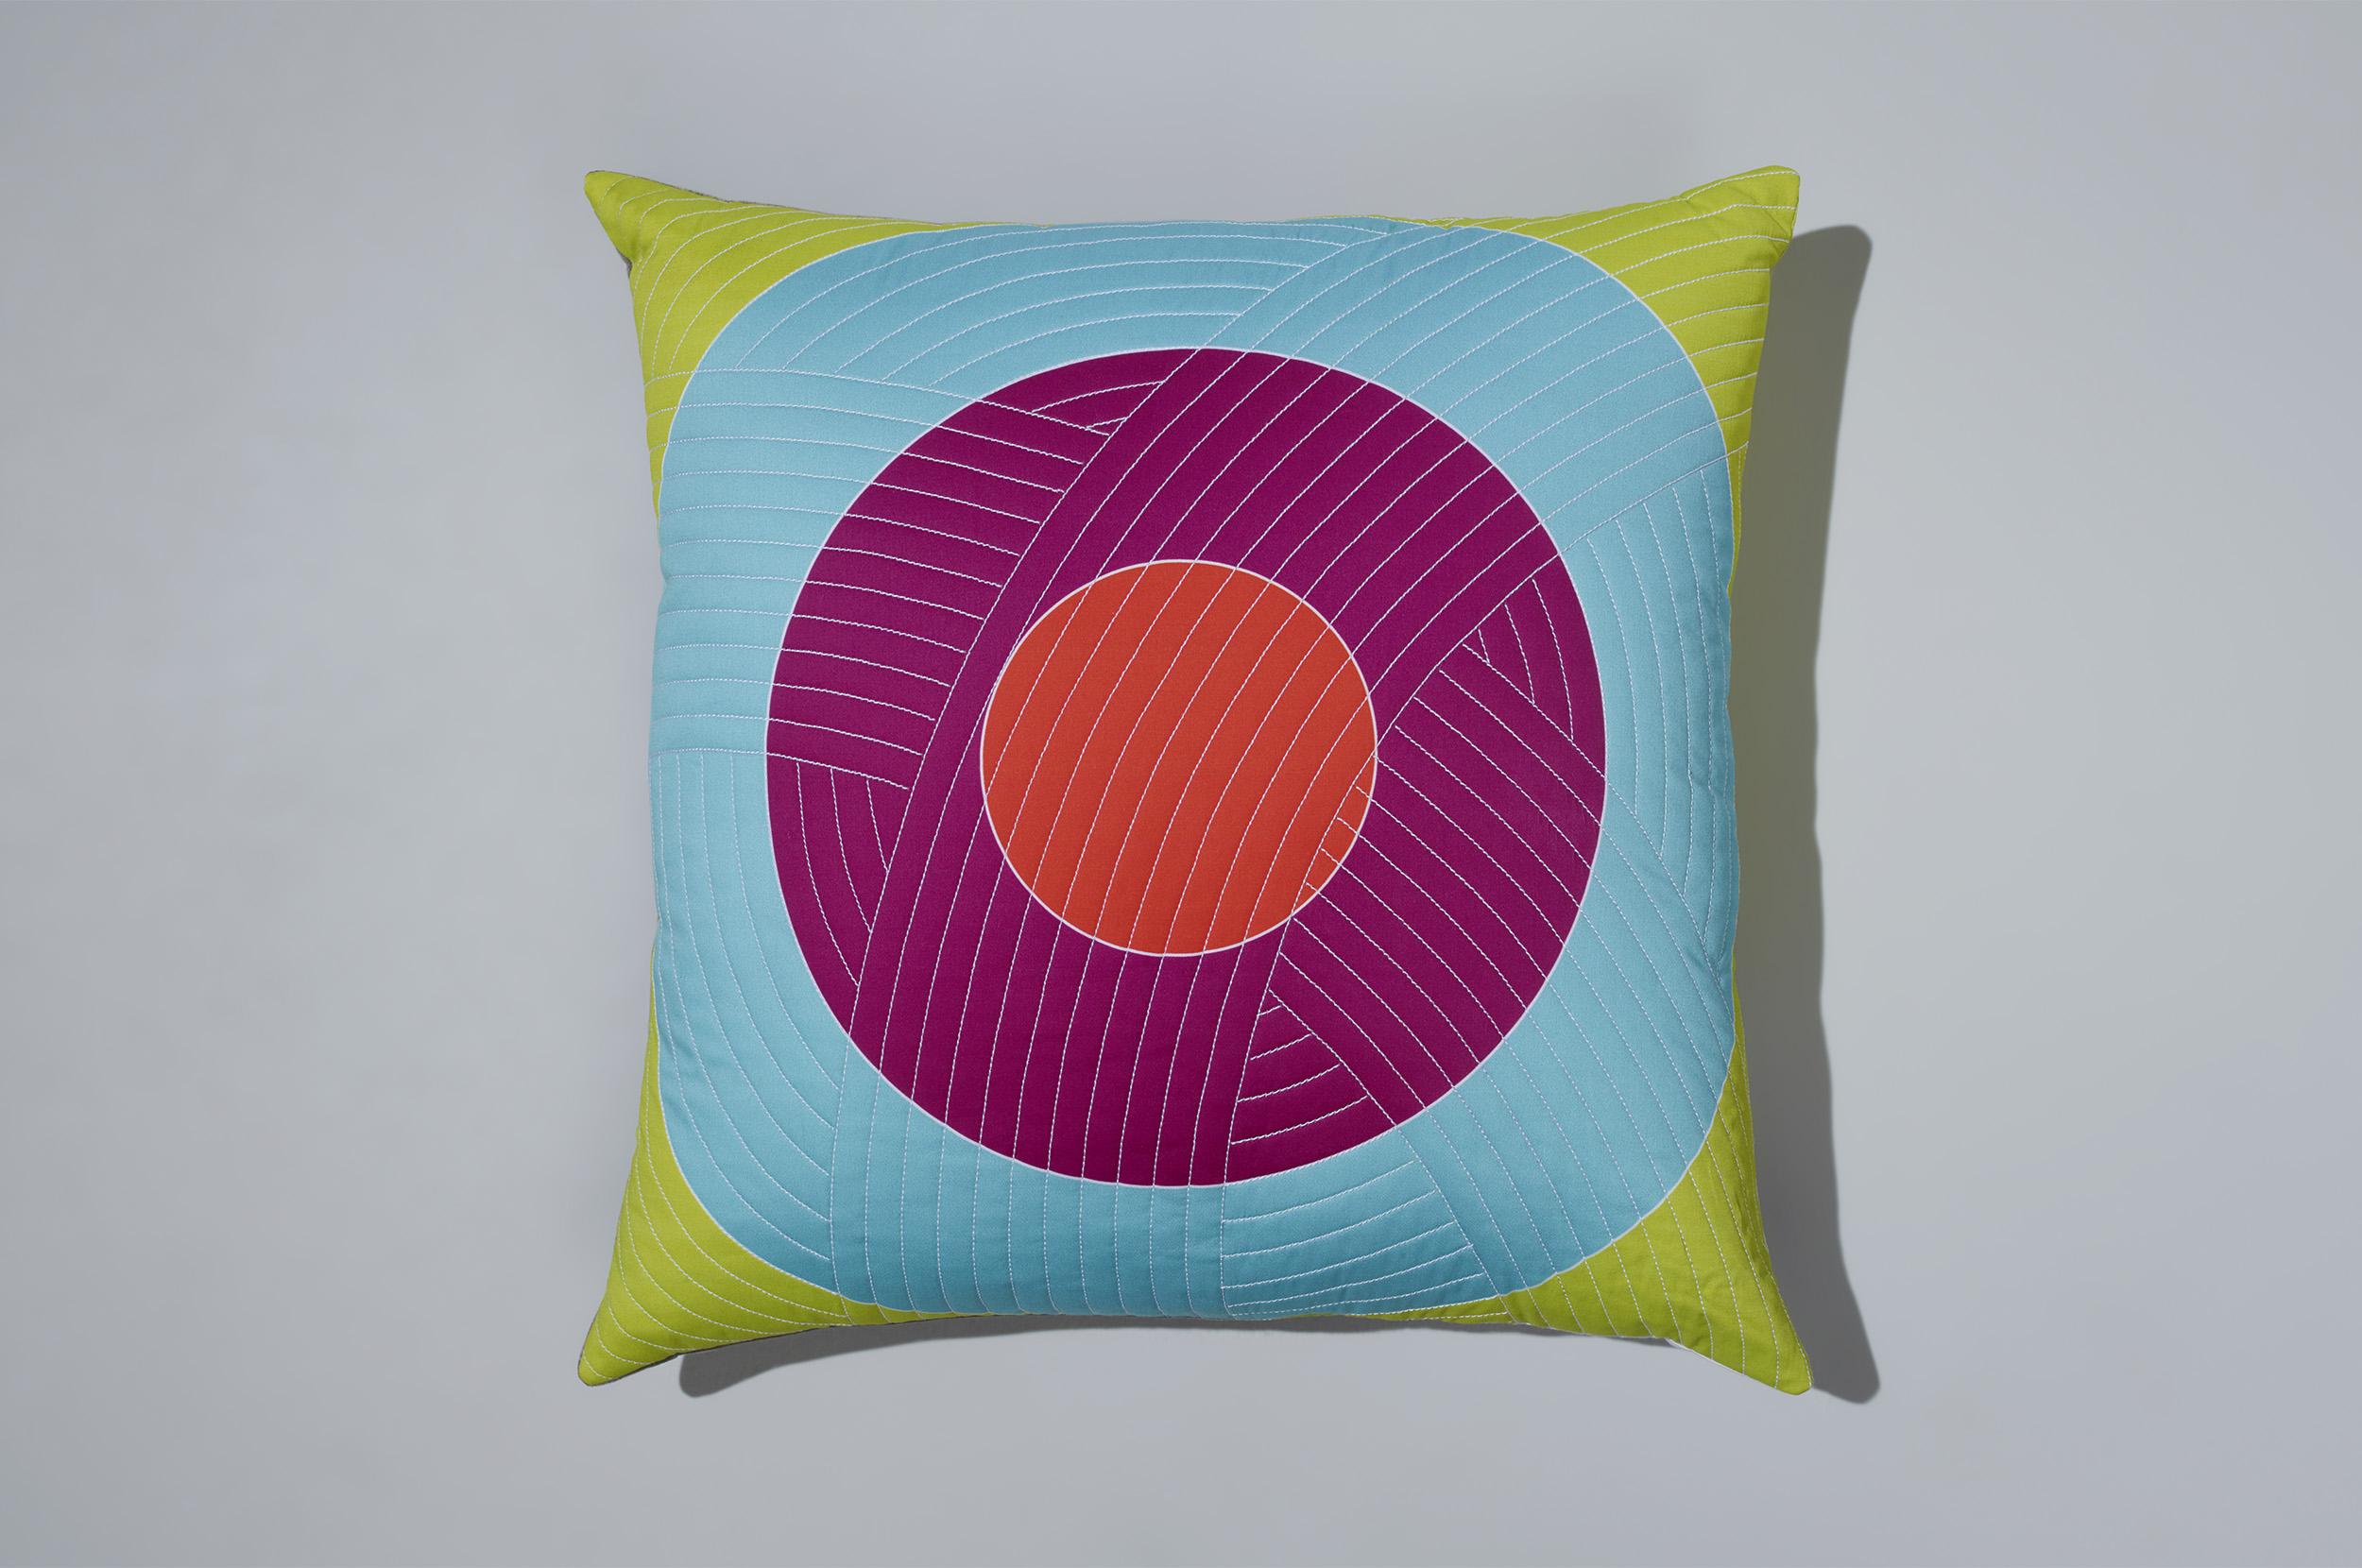 PostAndGleam_Pillows_OrangePinkBlueGreenCircle_COMP_Oa_FL2500.JPG